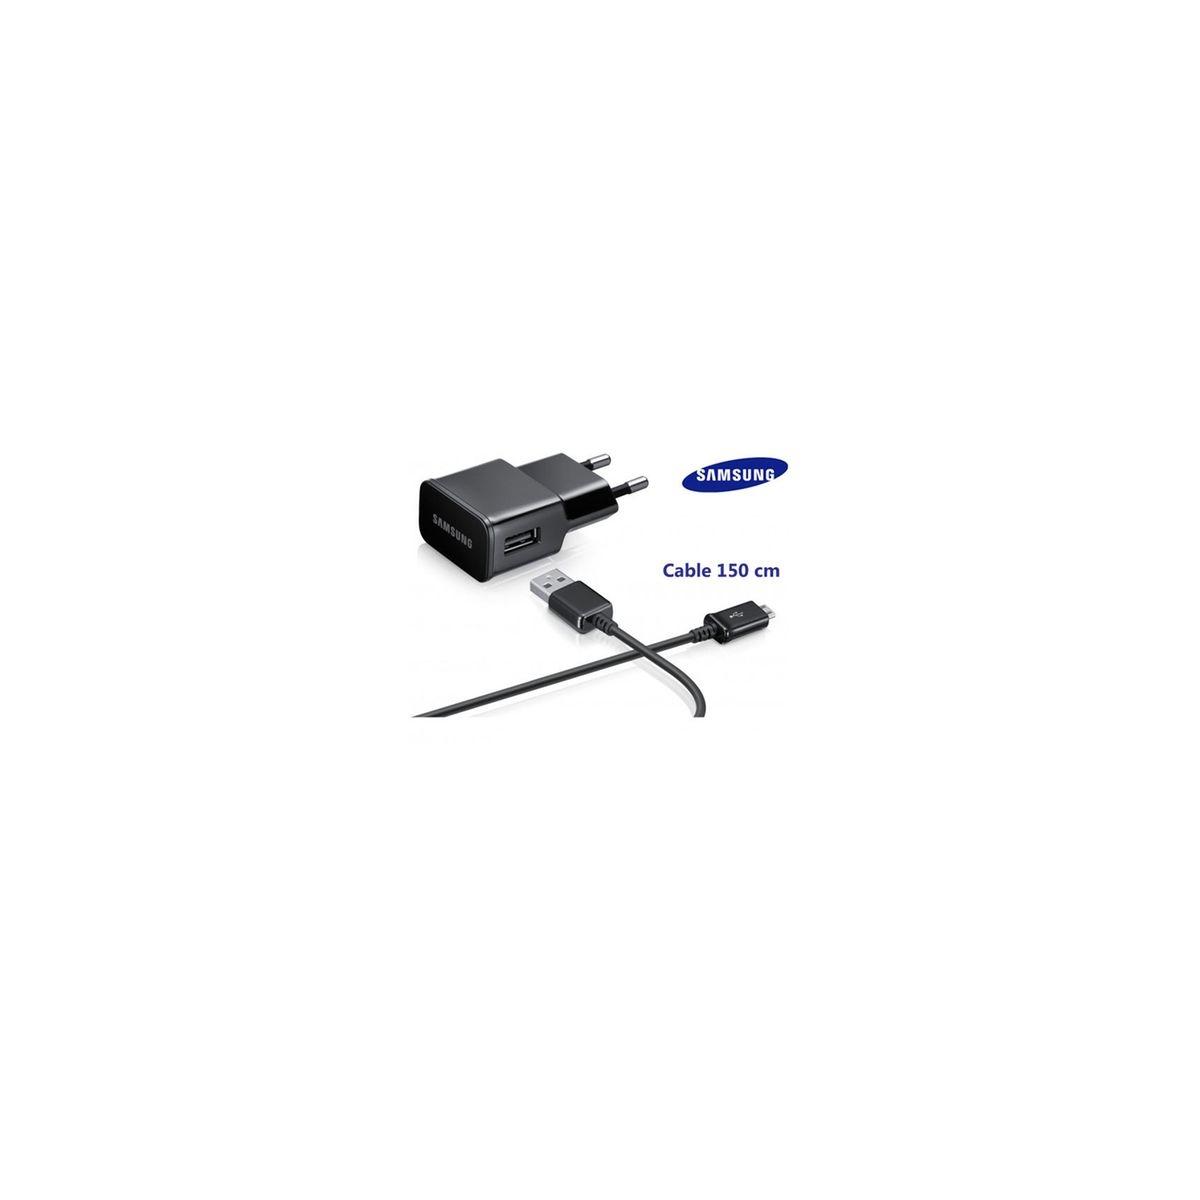 Galaxy A3 A300 Chargeur 2a Avec Cable 1,5m Origine Micro-usb